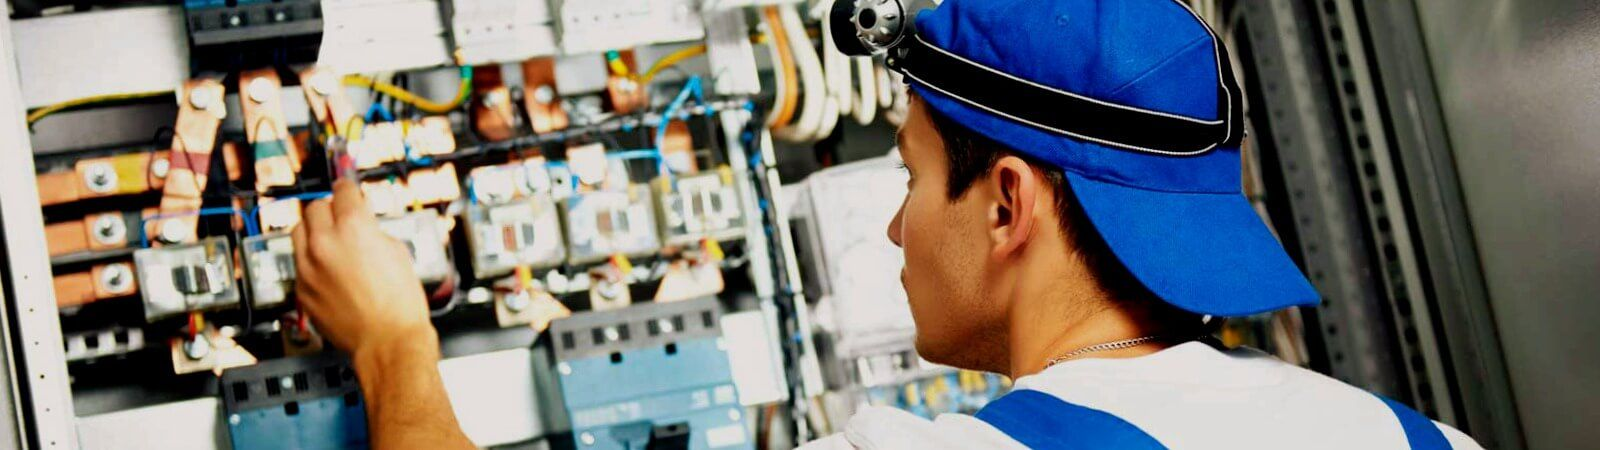 electricistas de Arregla2 Ontinyent autorizados